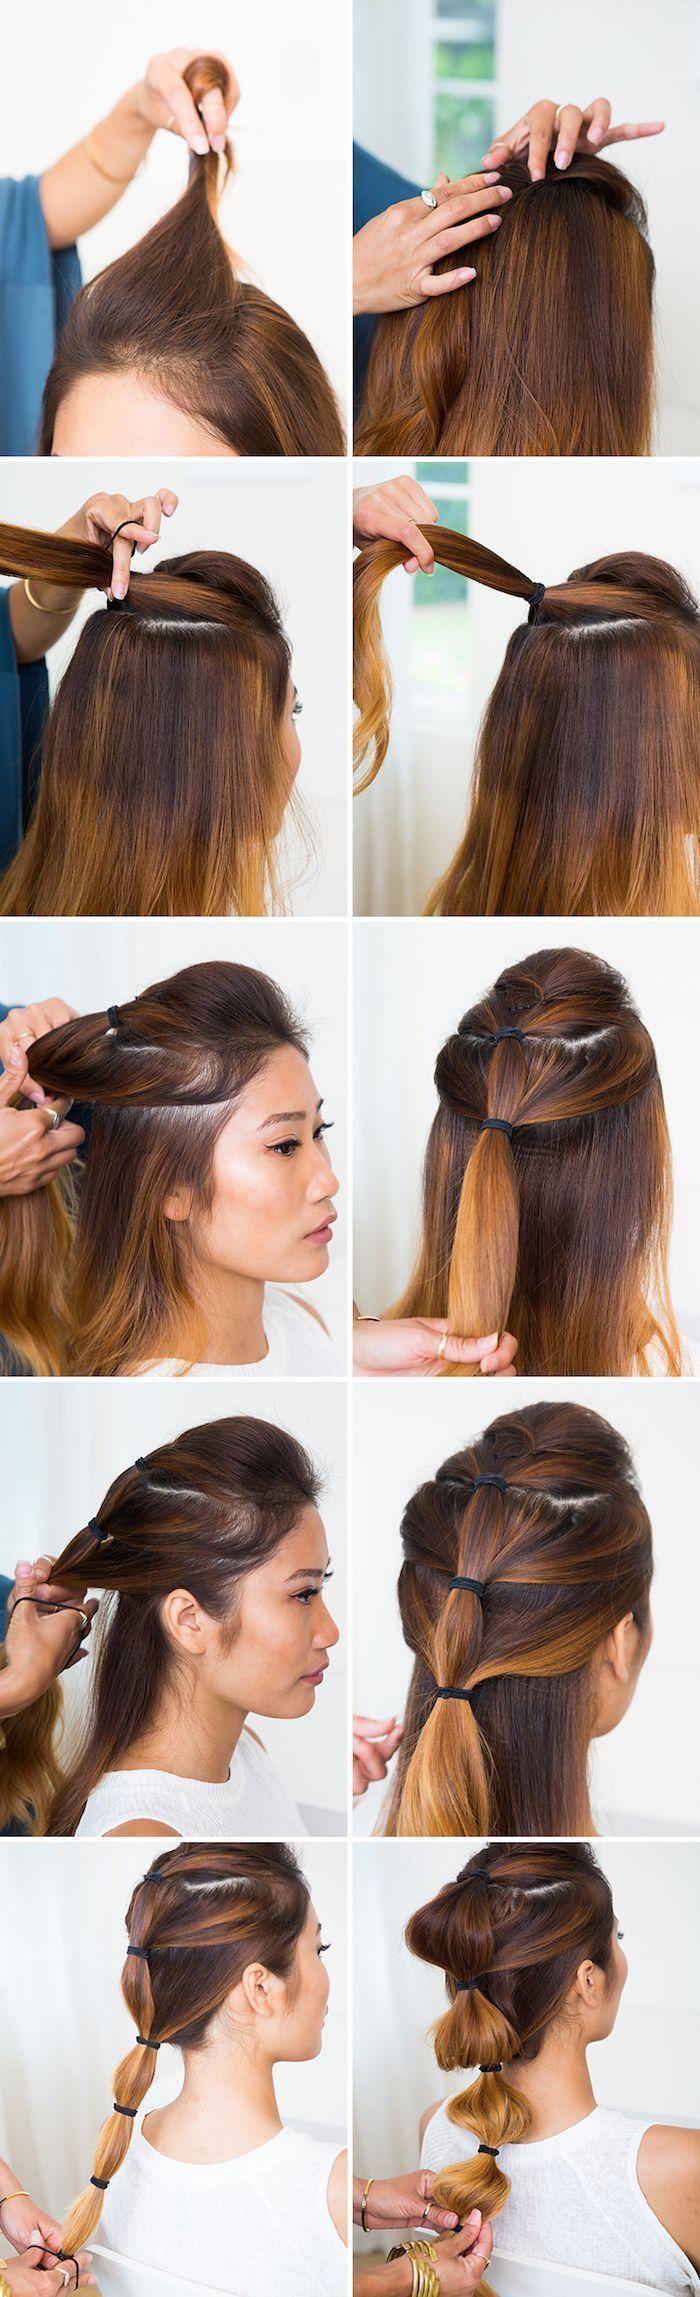 hairstyles long hair brown hair in ombre look bubble braid make yourself   Braids tutorial Braids tutorial